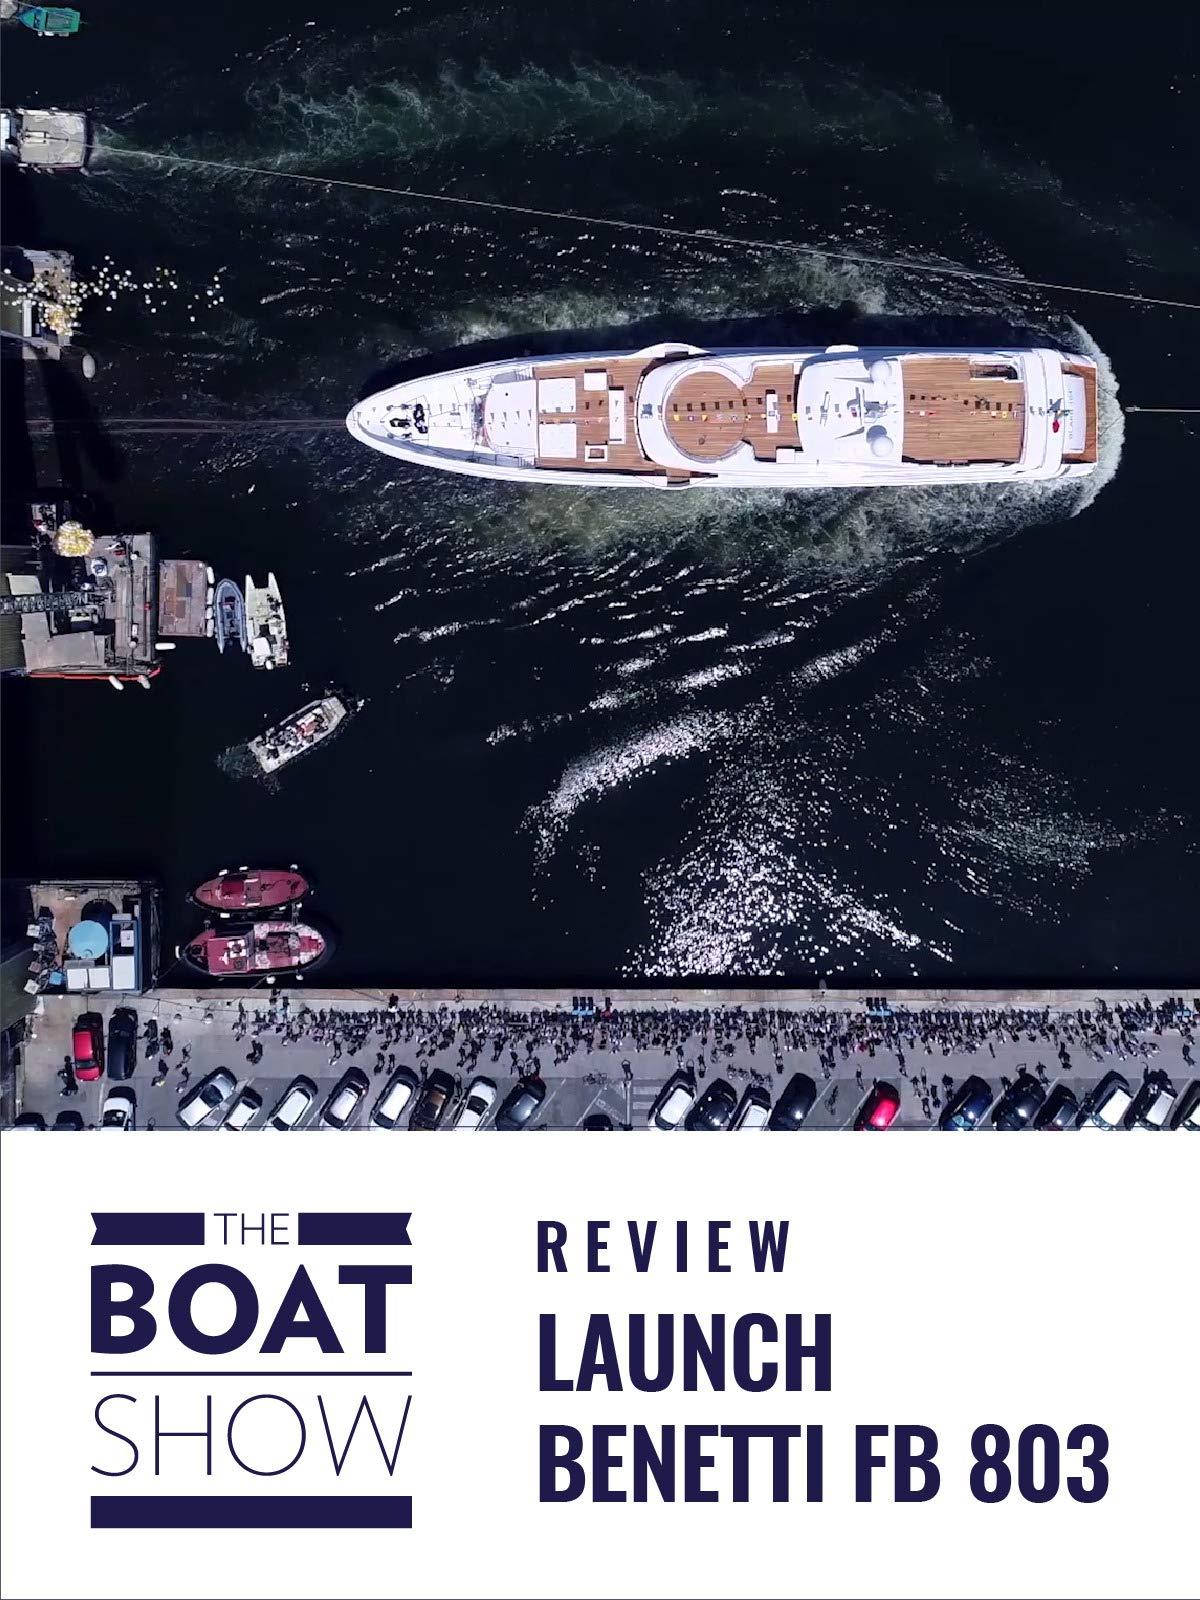 Launch Benetti FB 803 - The Boat Show